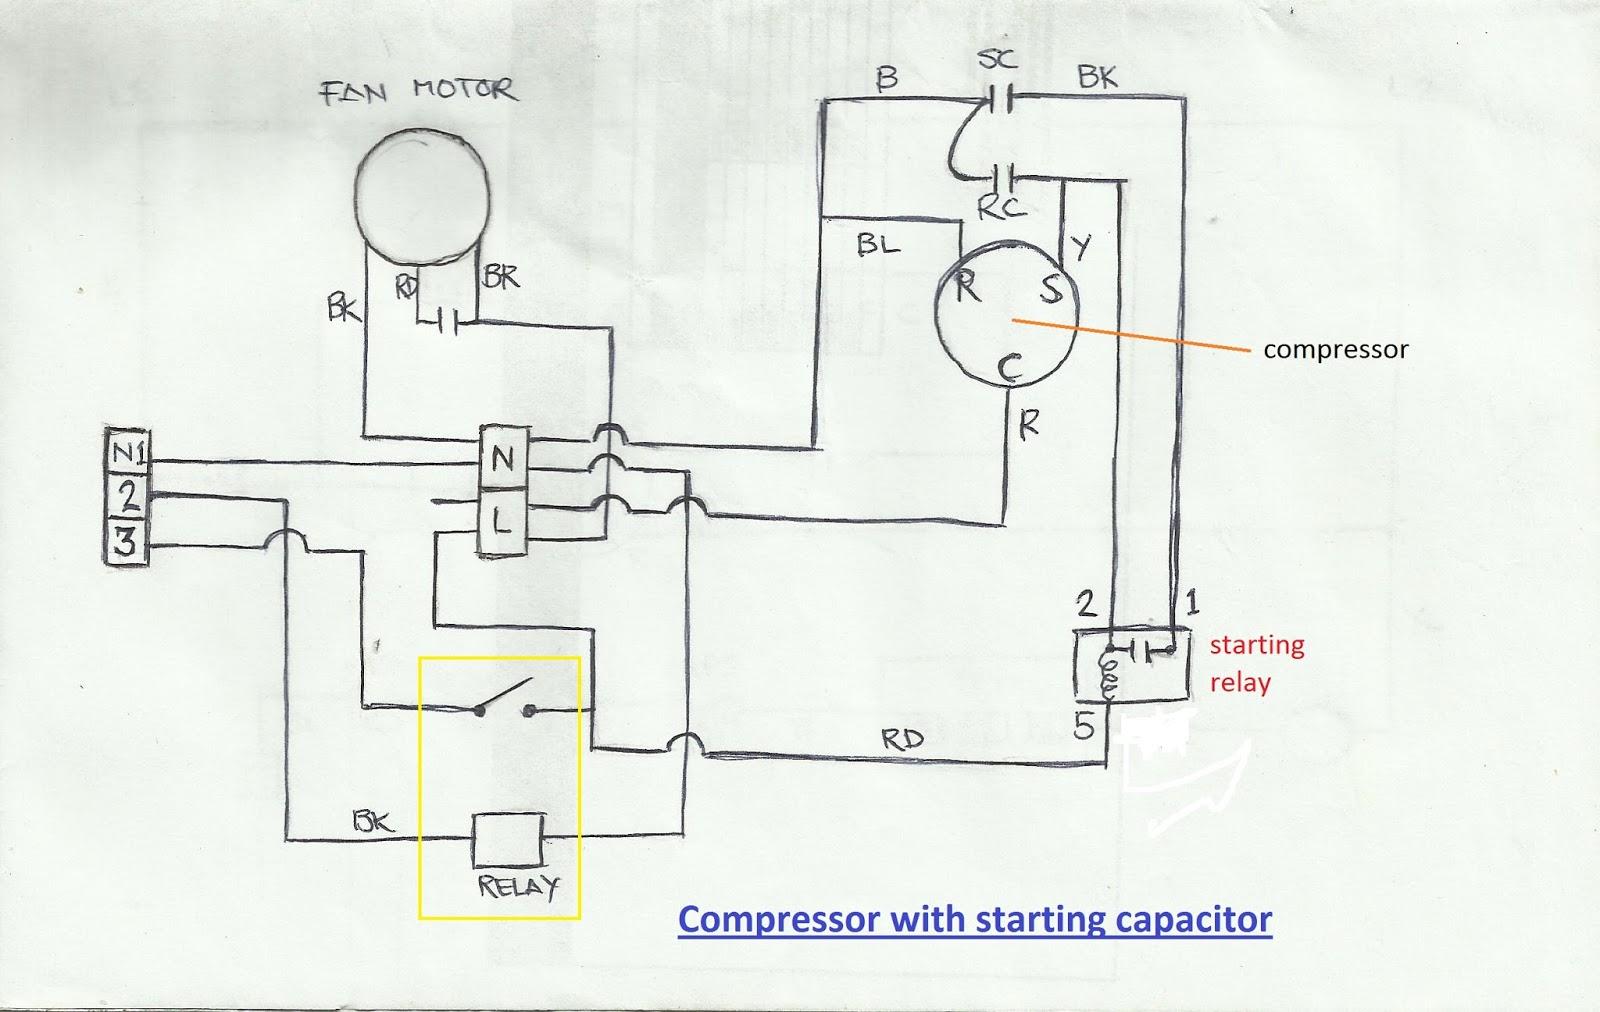 tecumseh capacitance crankcase heater wiring diagram. Black Bedroom Furniture Sets. Home Design Ideas